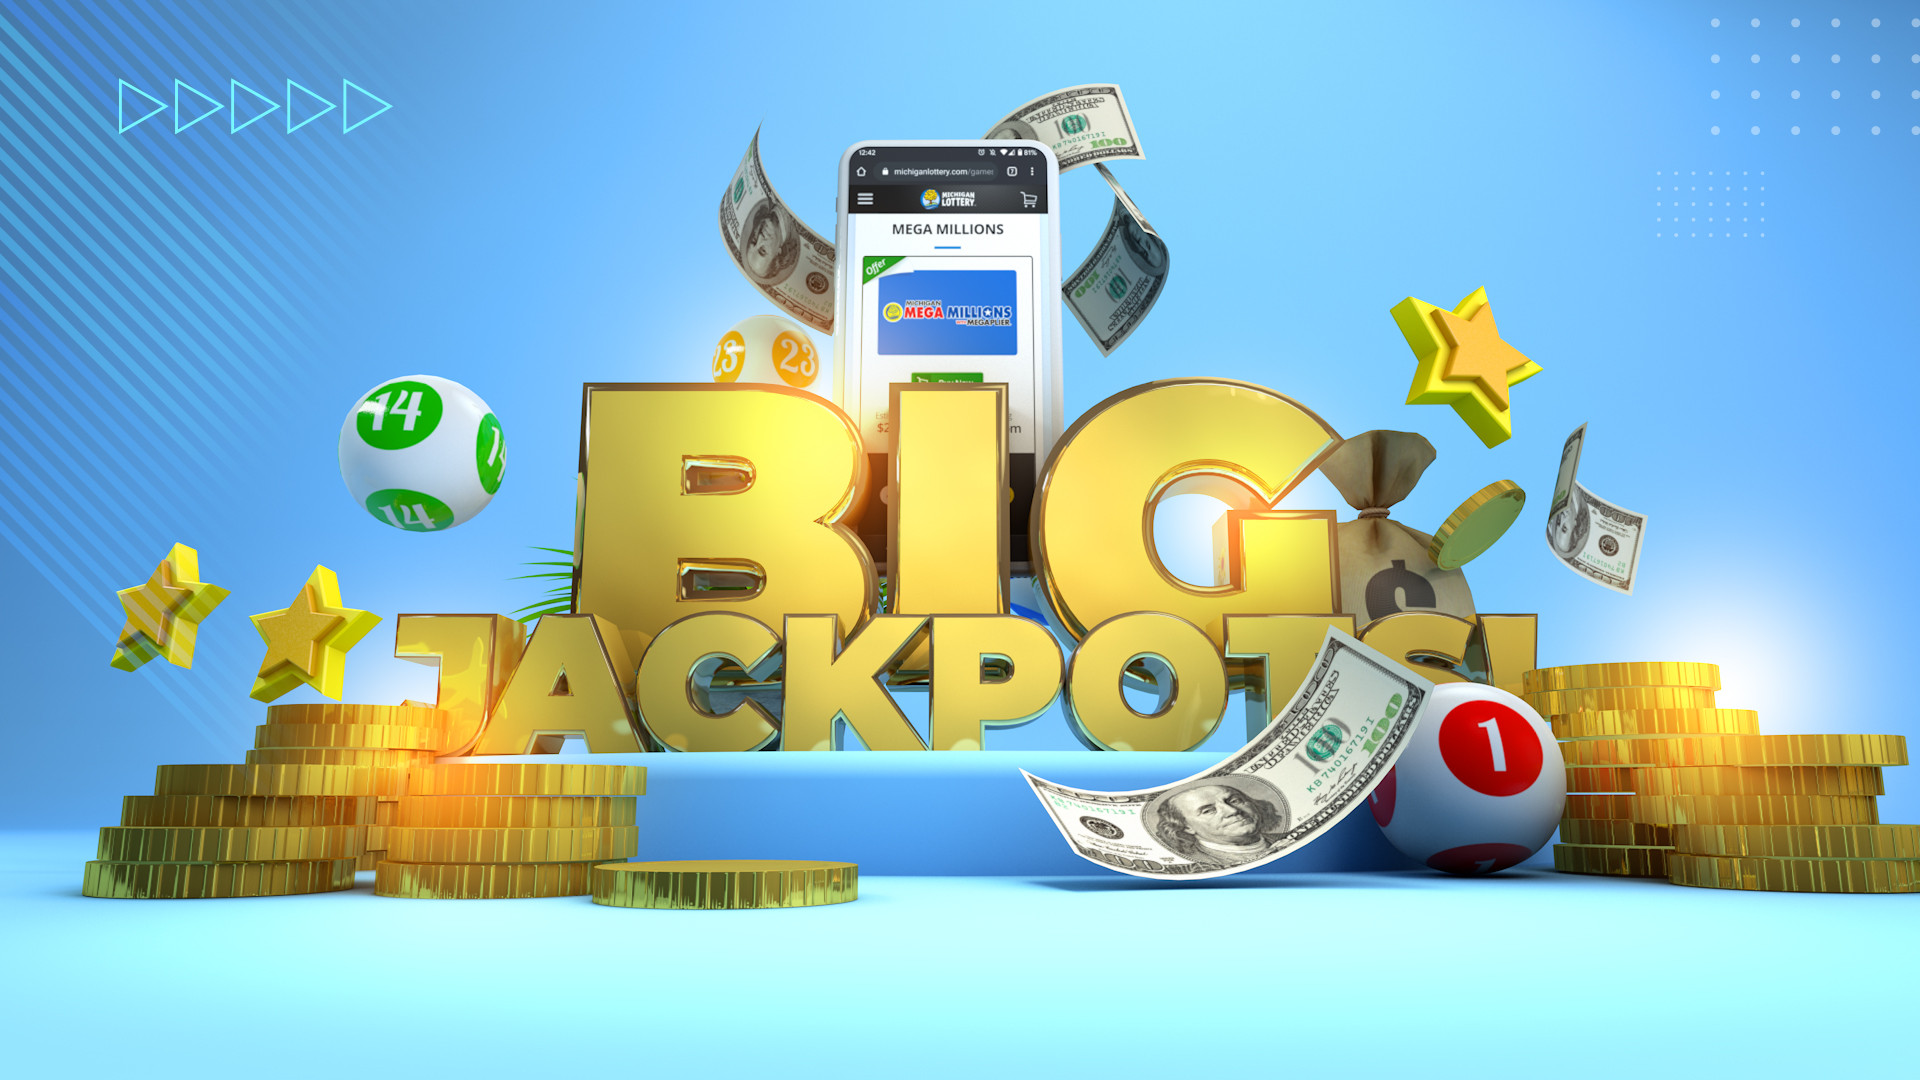 Big_JackPot_02_E.jpg